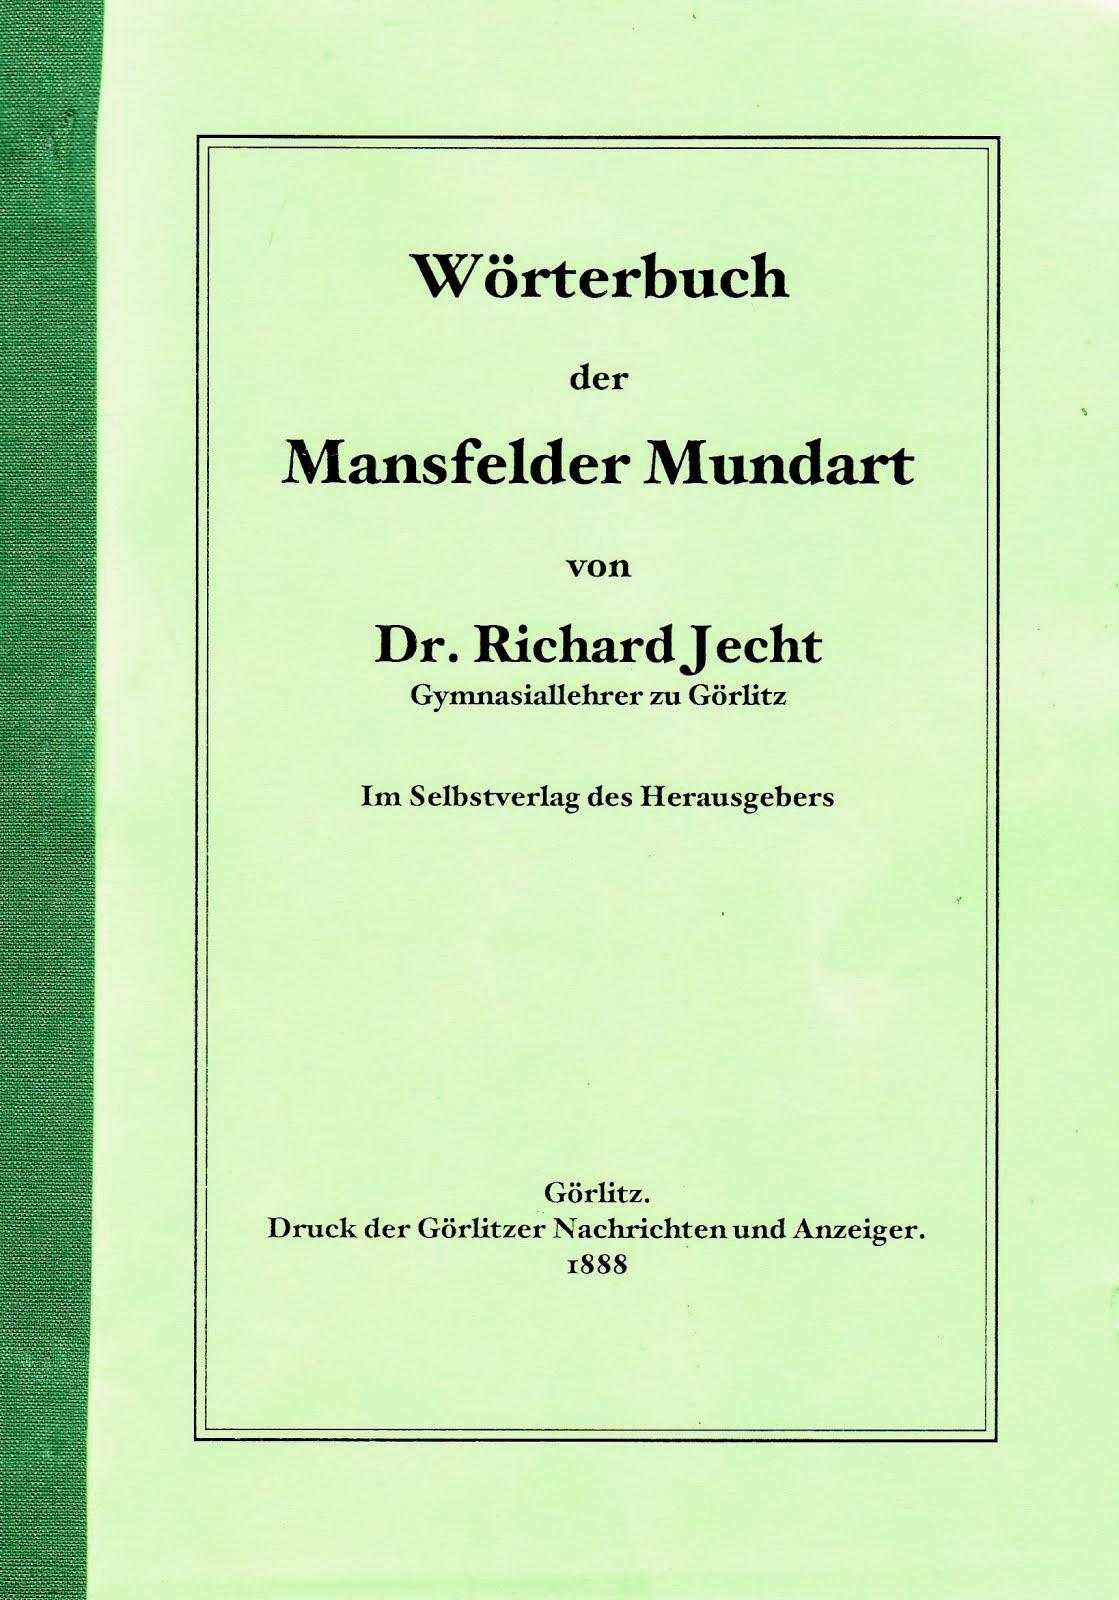 Wörterbuch der Mansfelder Mundart